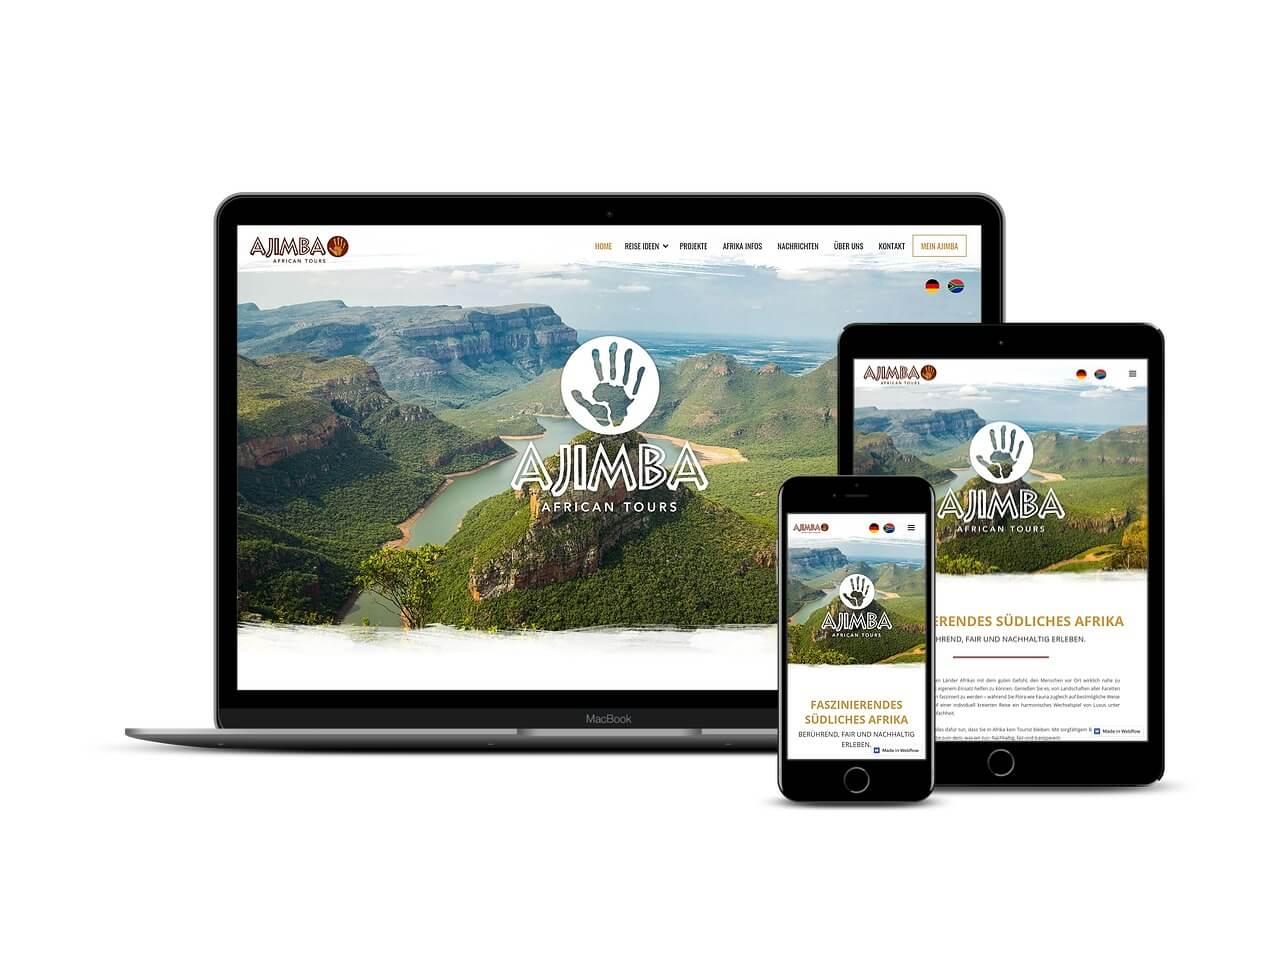 Custom Web Development Projects - Ajimba African Tours